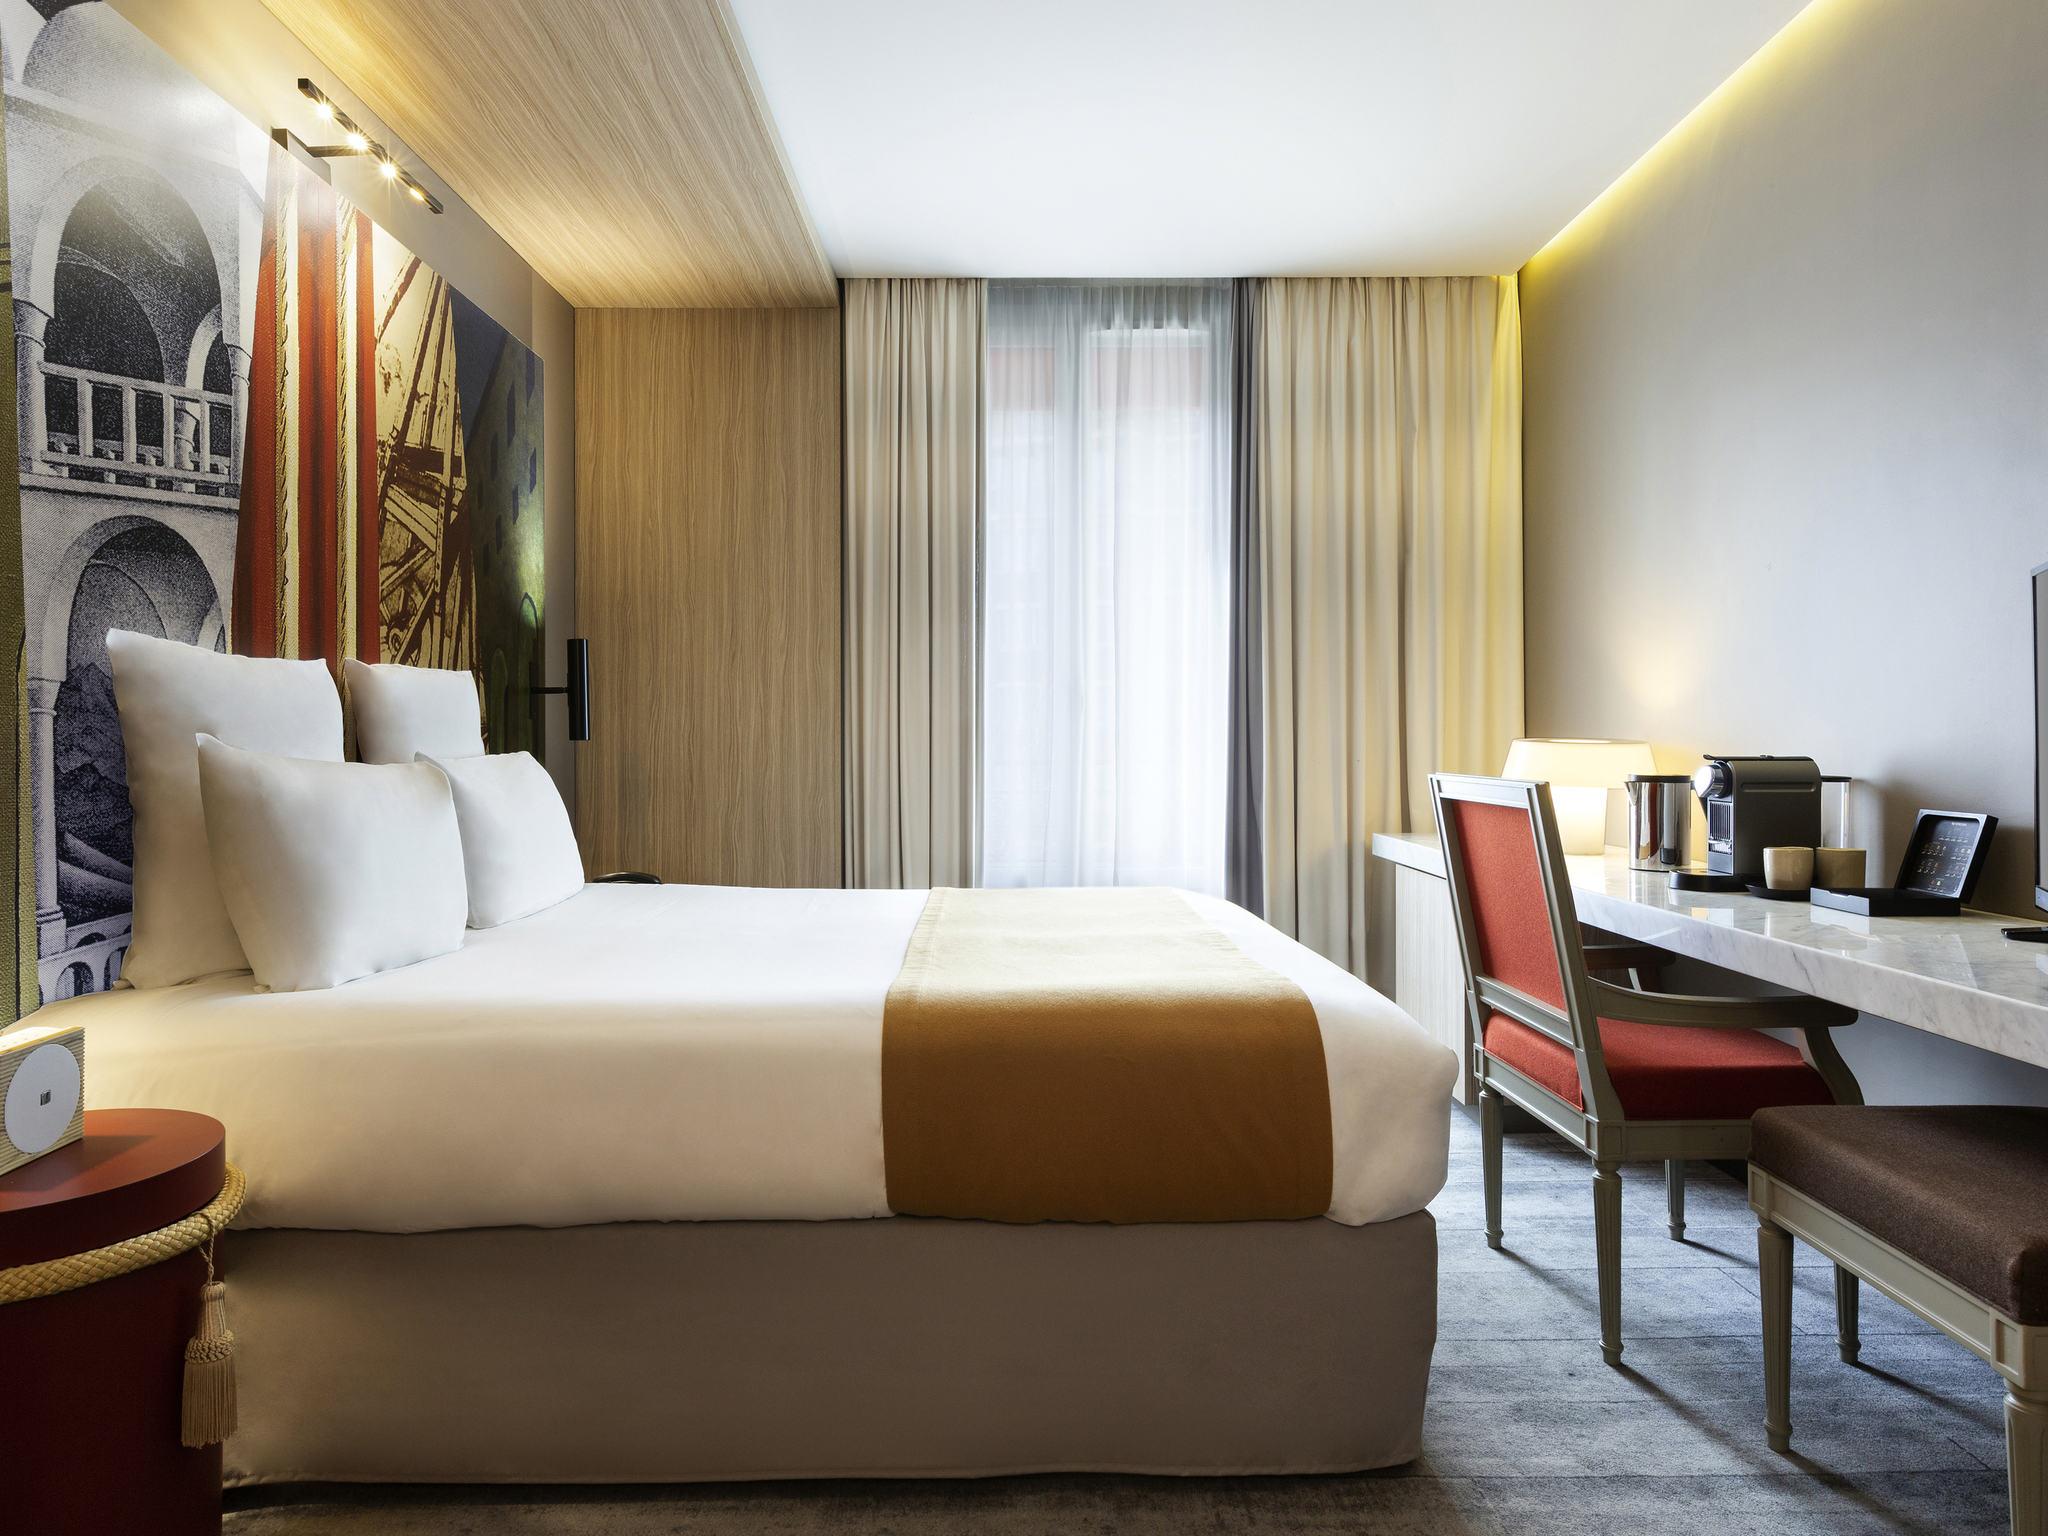 Hotel - Hotel Mercure Paris Alésia